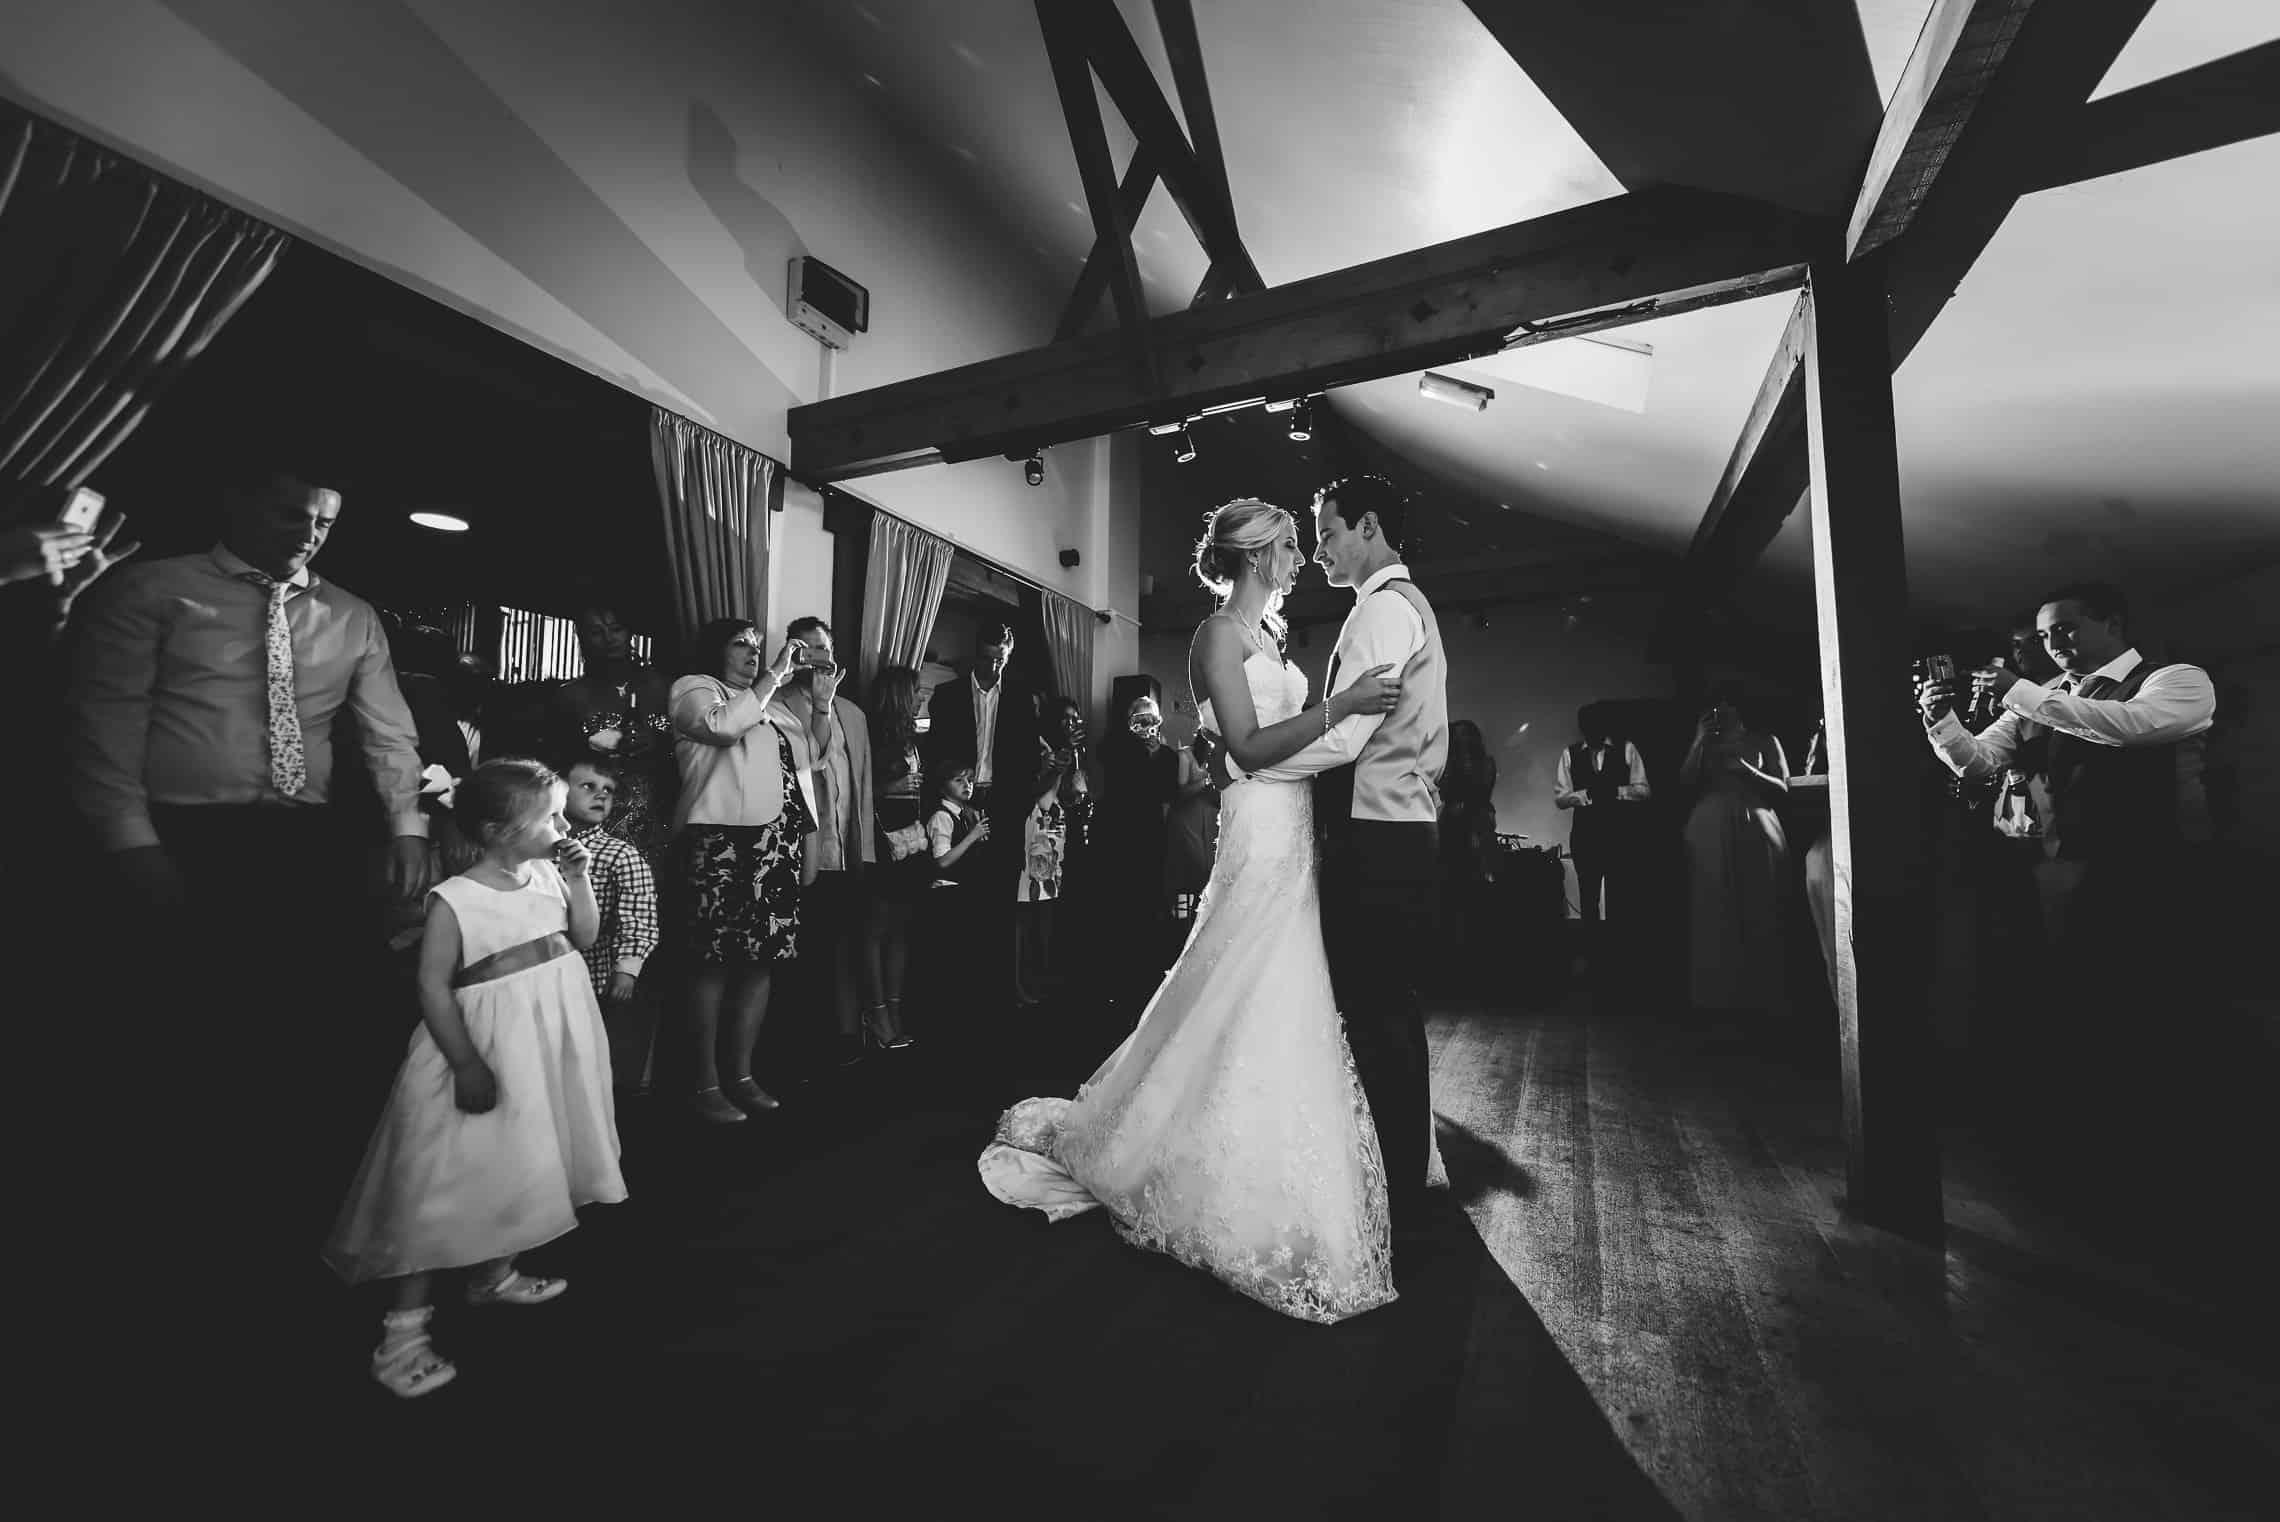 gaynes_park_wedding_lm_justin_bailey_photography_019